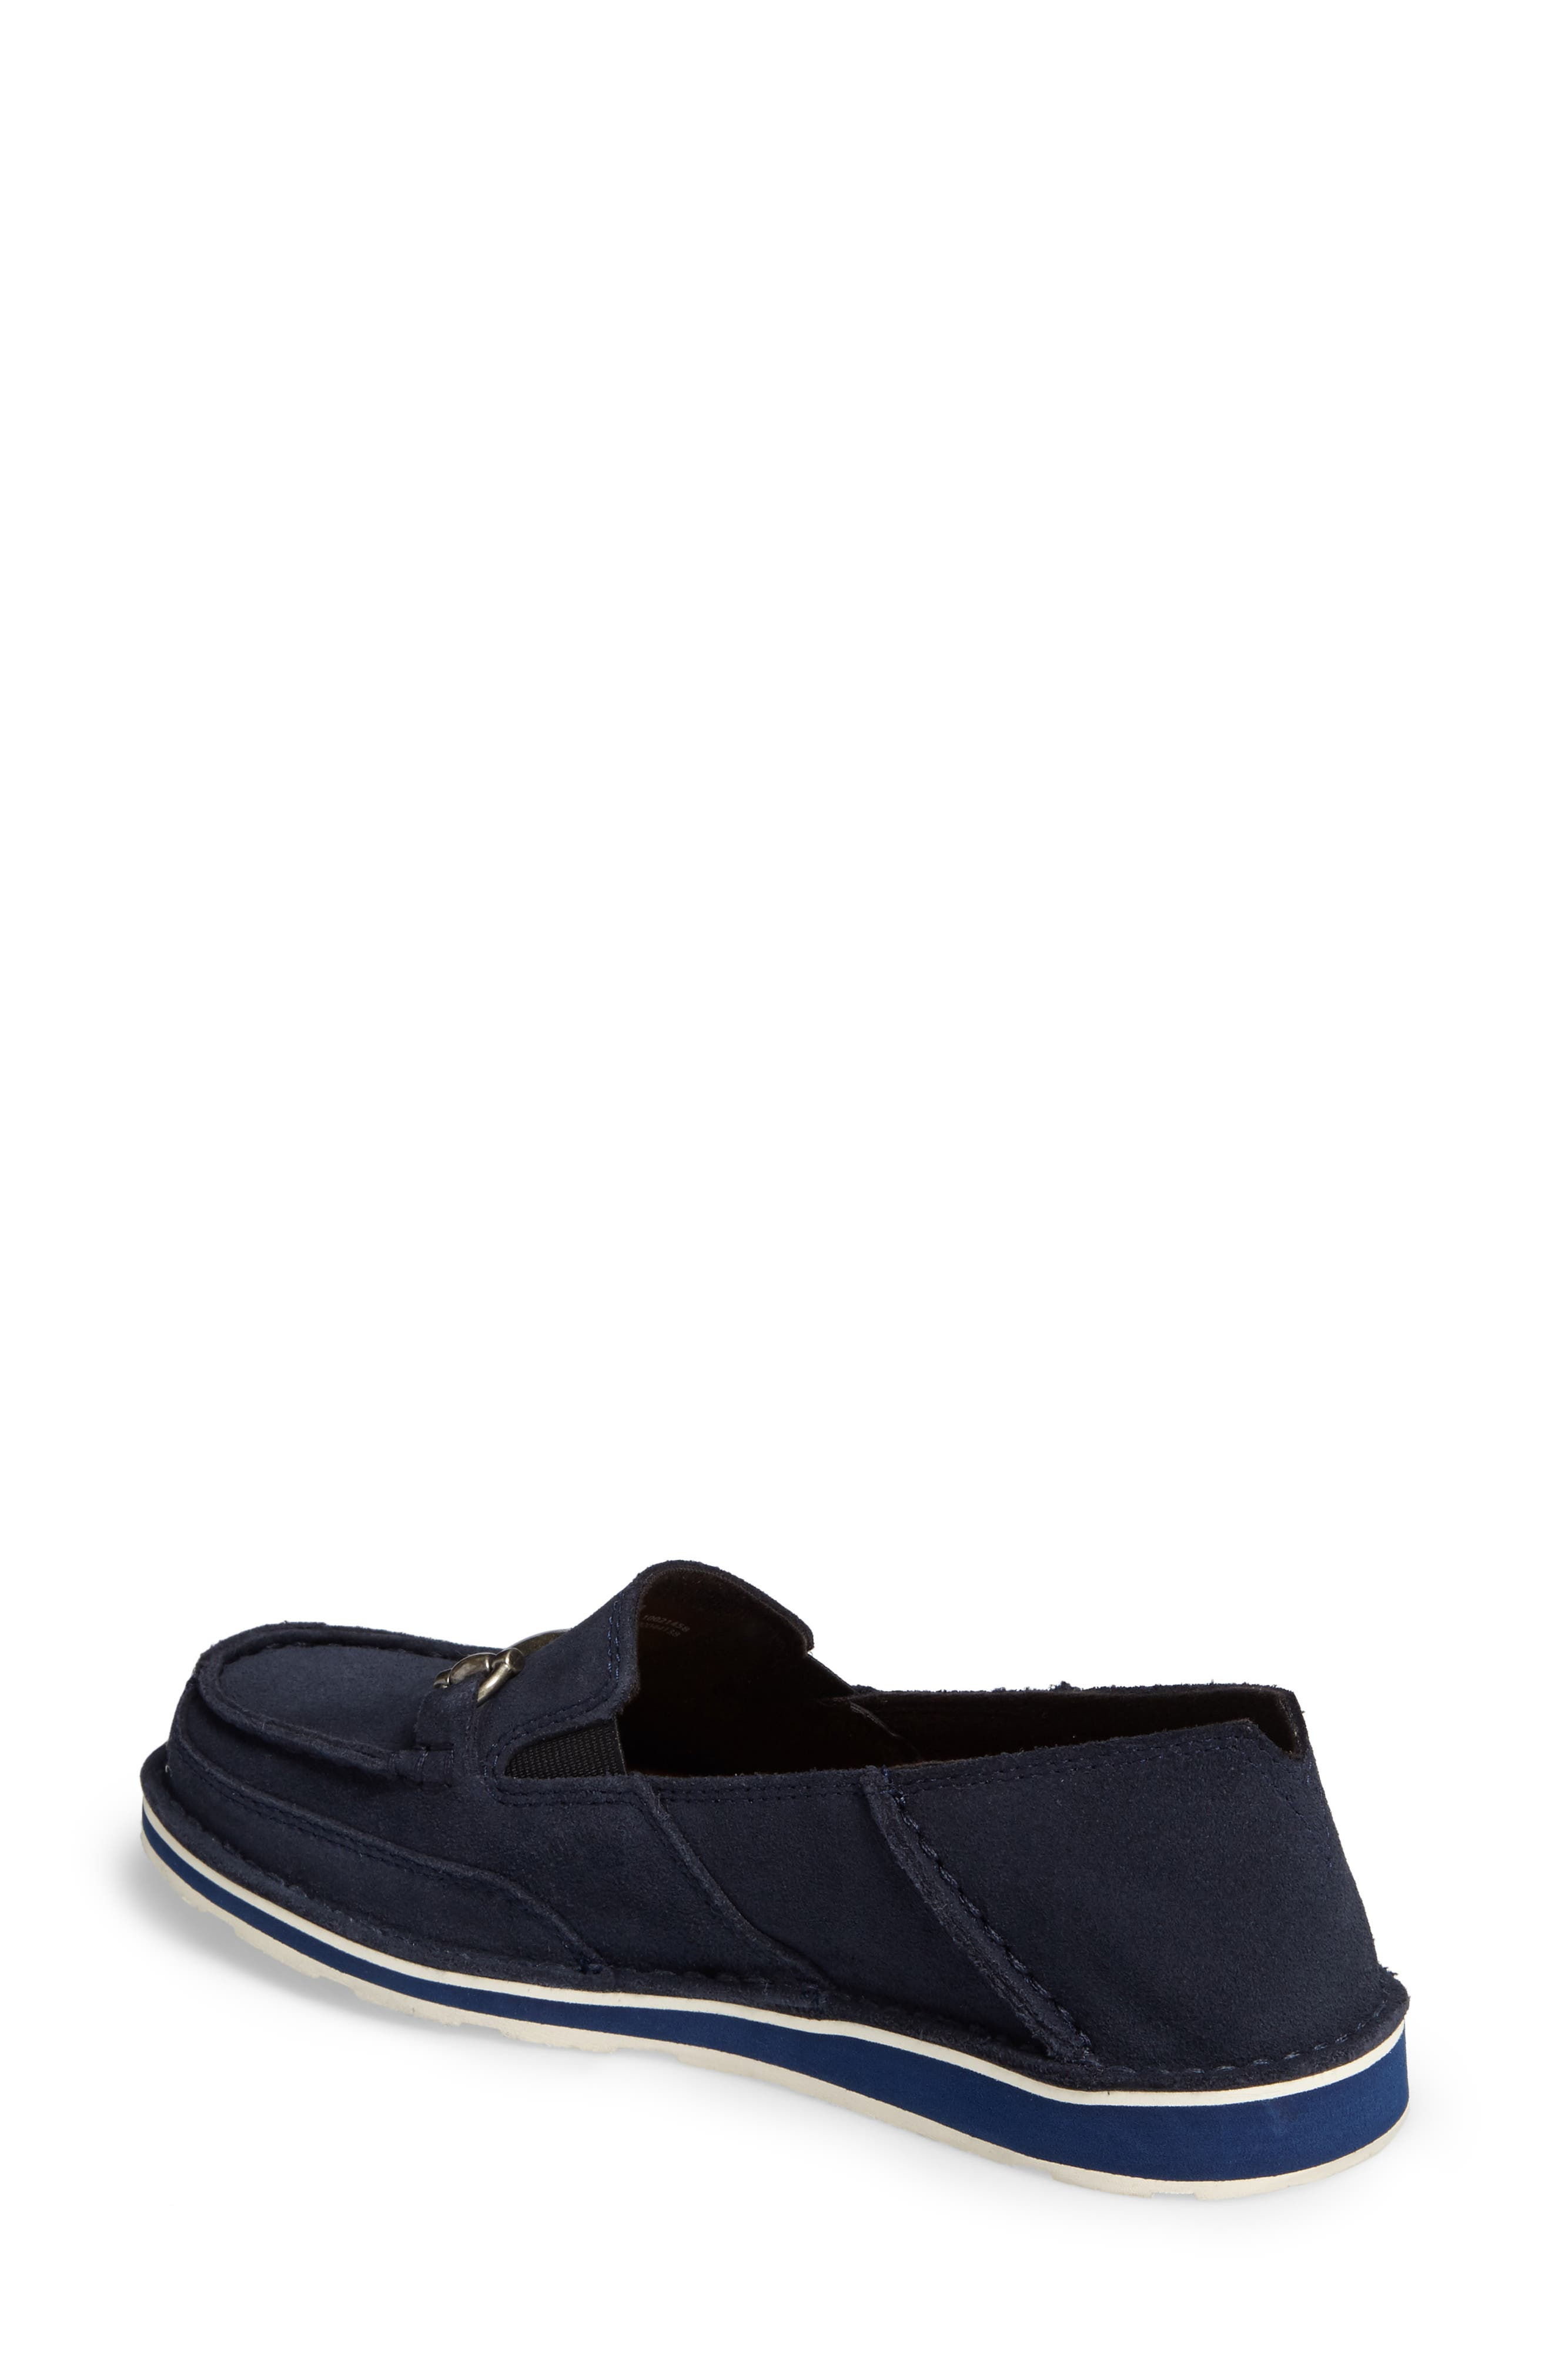 Alternate Image 2  - Ariat Bit Cruiser Loafer